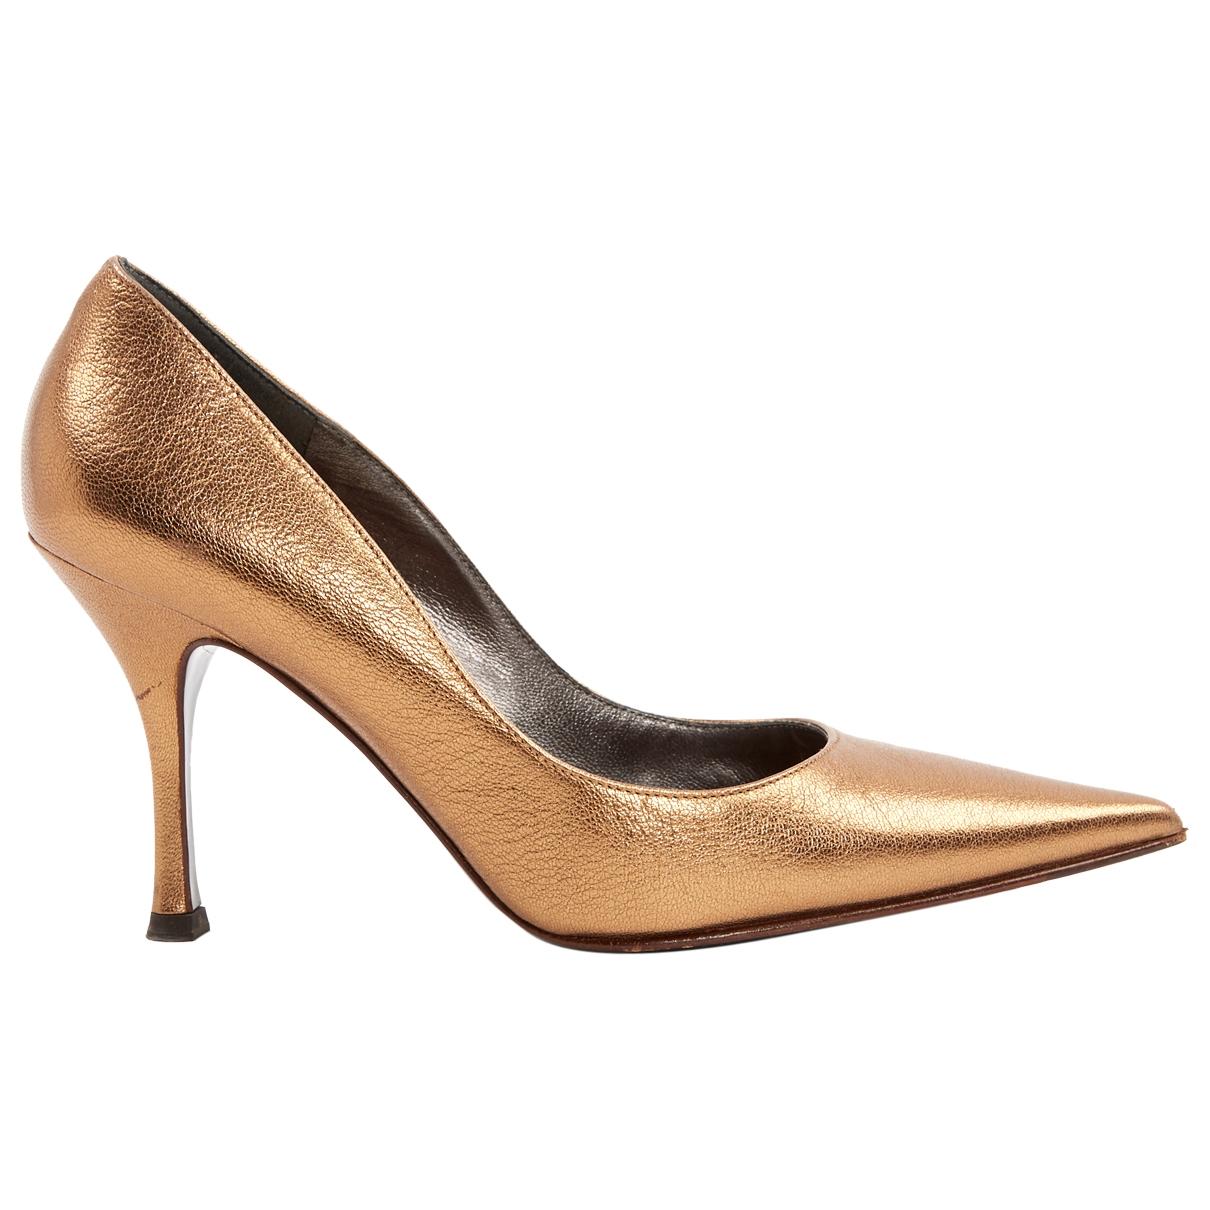 Dolce & Gabbana \N Gold Leather Heels for Women 36.5 EU